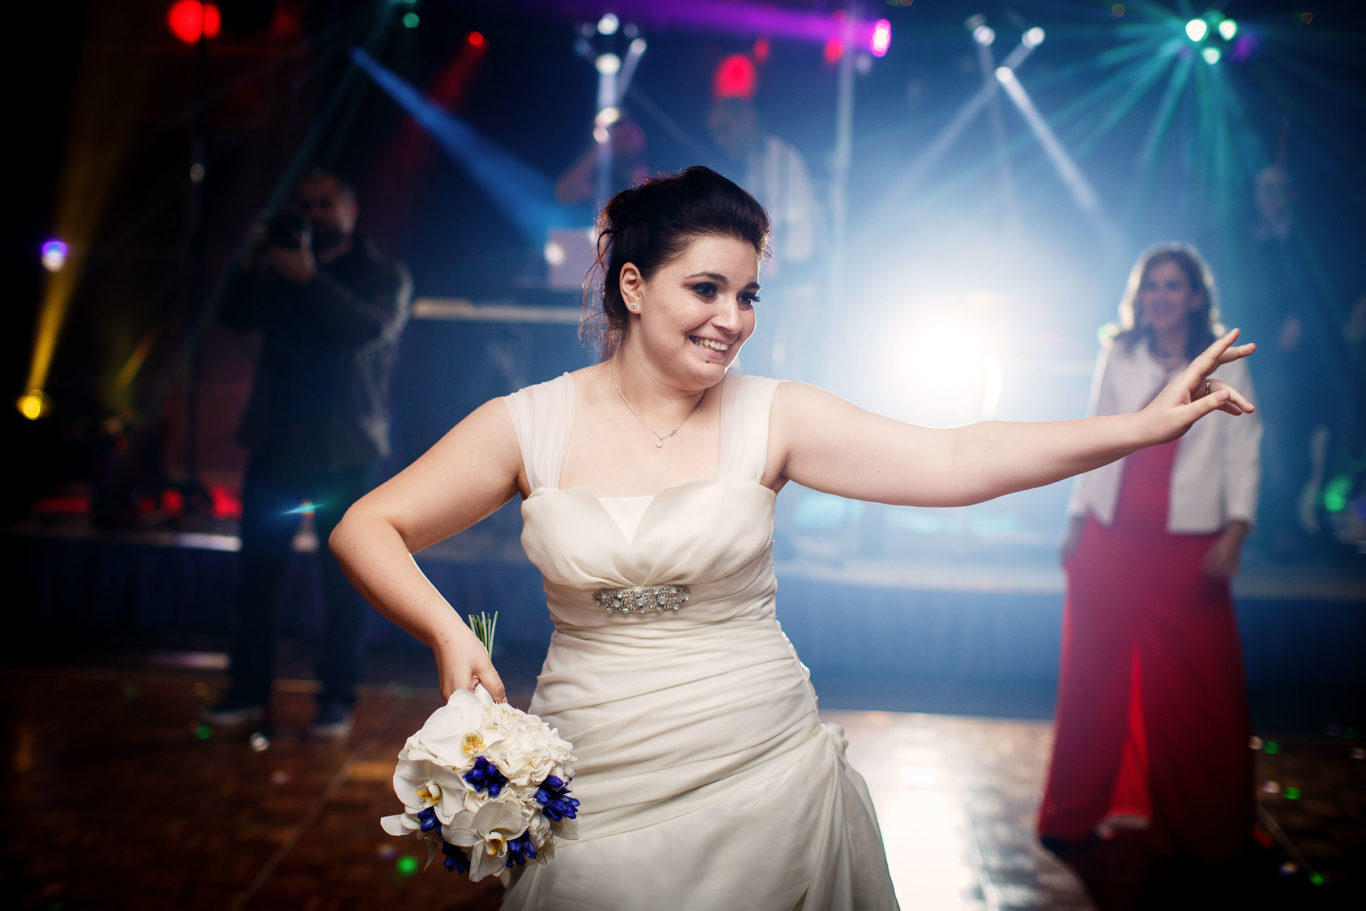 0781-Fotografie-nunta-Roxana-Costin-fotograf-Ciprian-Dumitrescu-DC1X2381